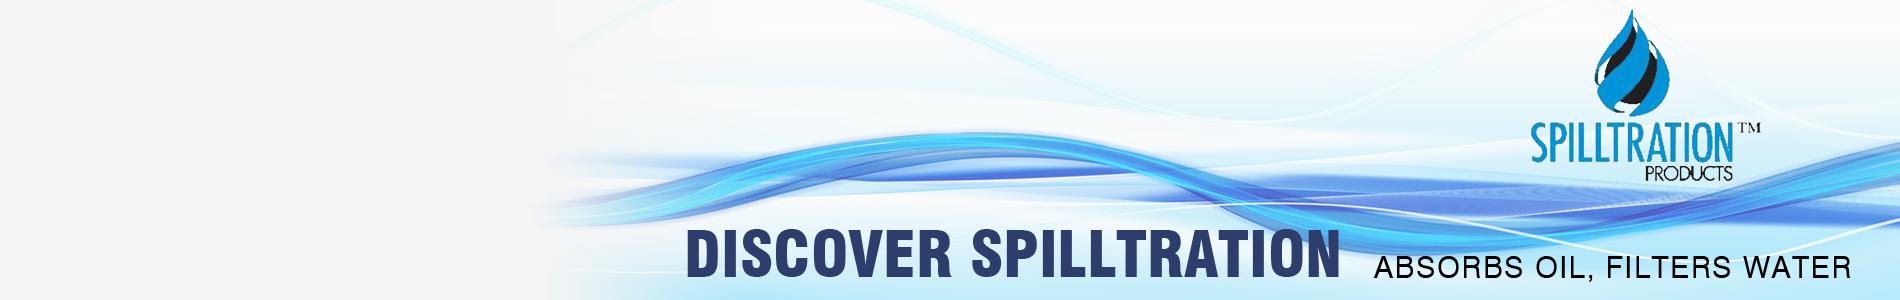 Spilltration banner